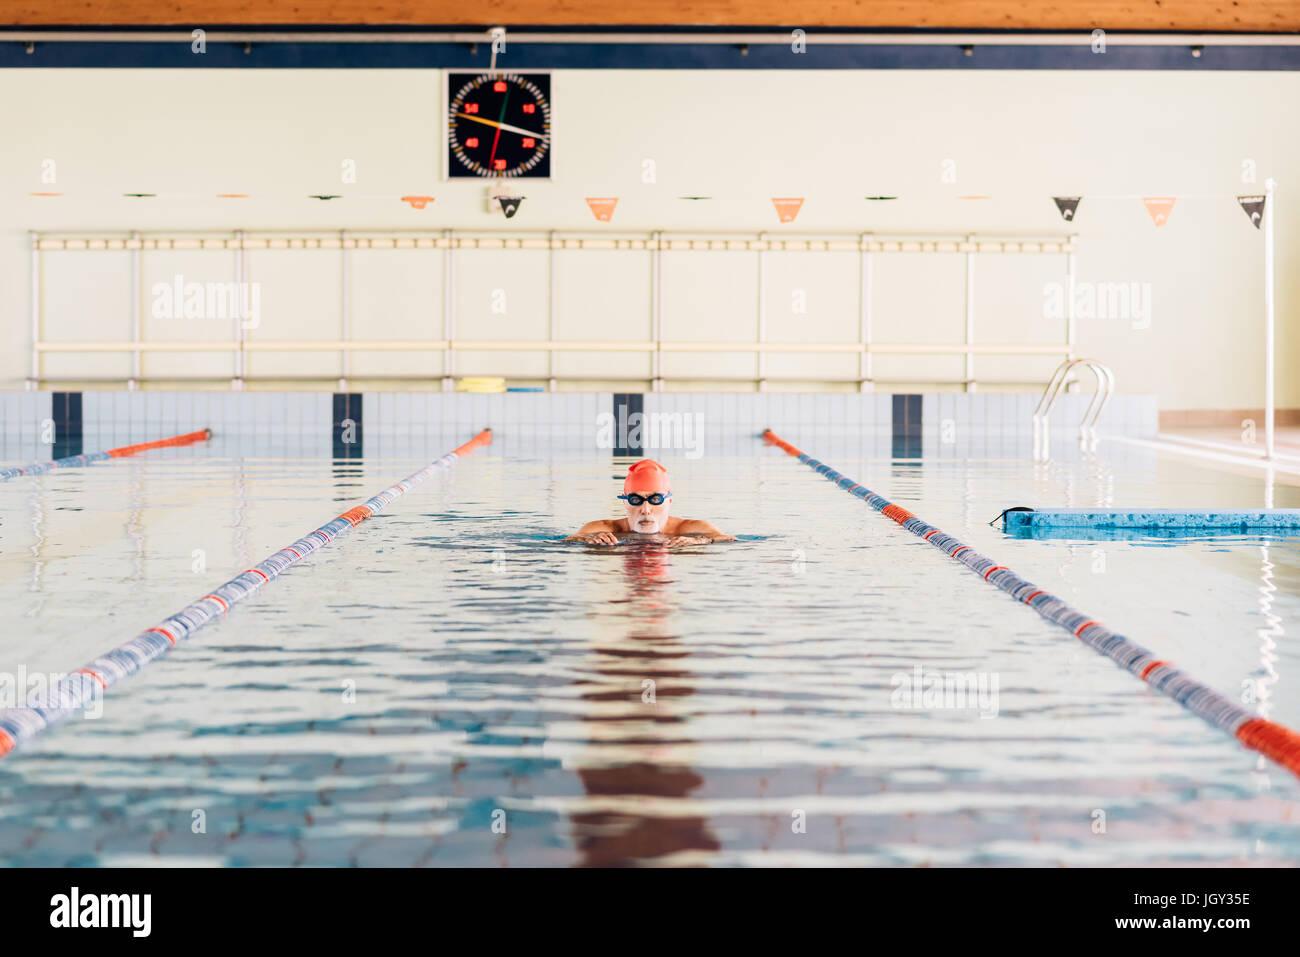 Hombre Senior nadar en piscina Imagen De Stock